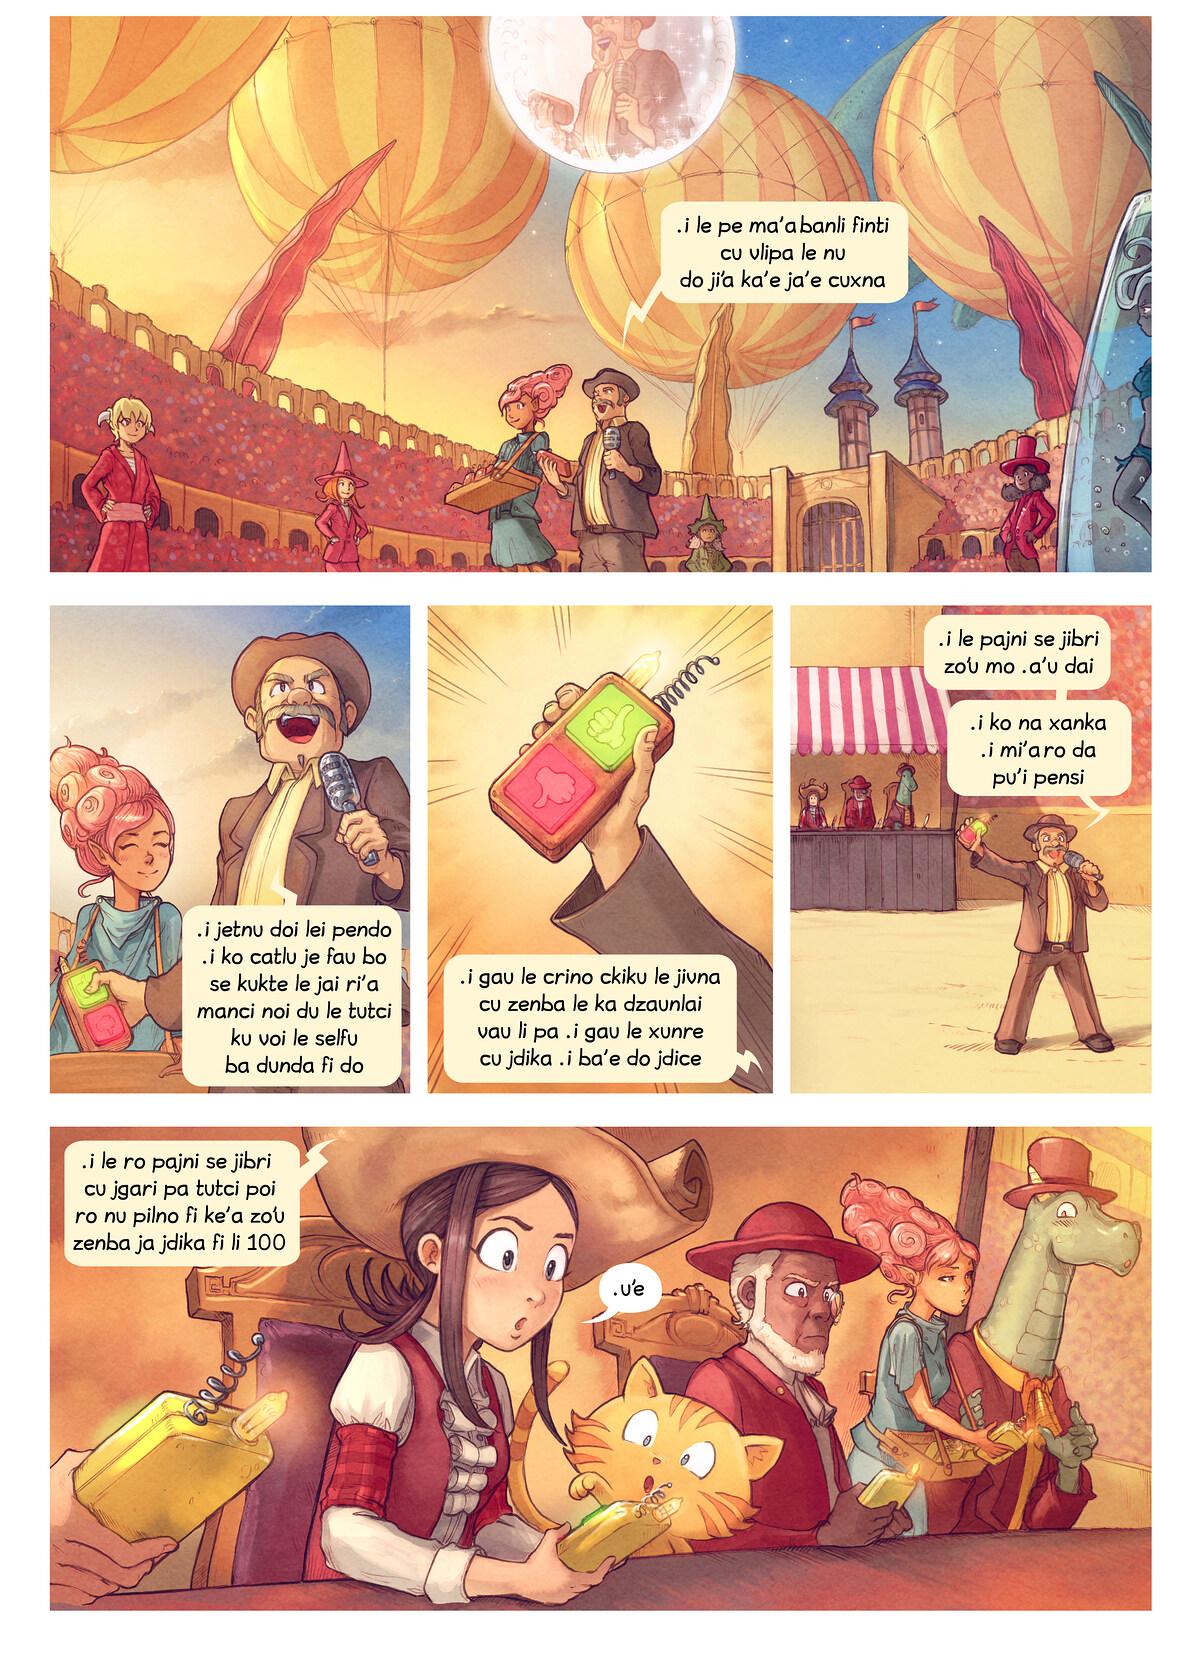 A webcomic page of Pepper&Carrot, pagbu 22 [jb], papri 2